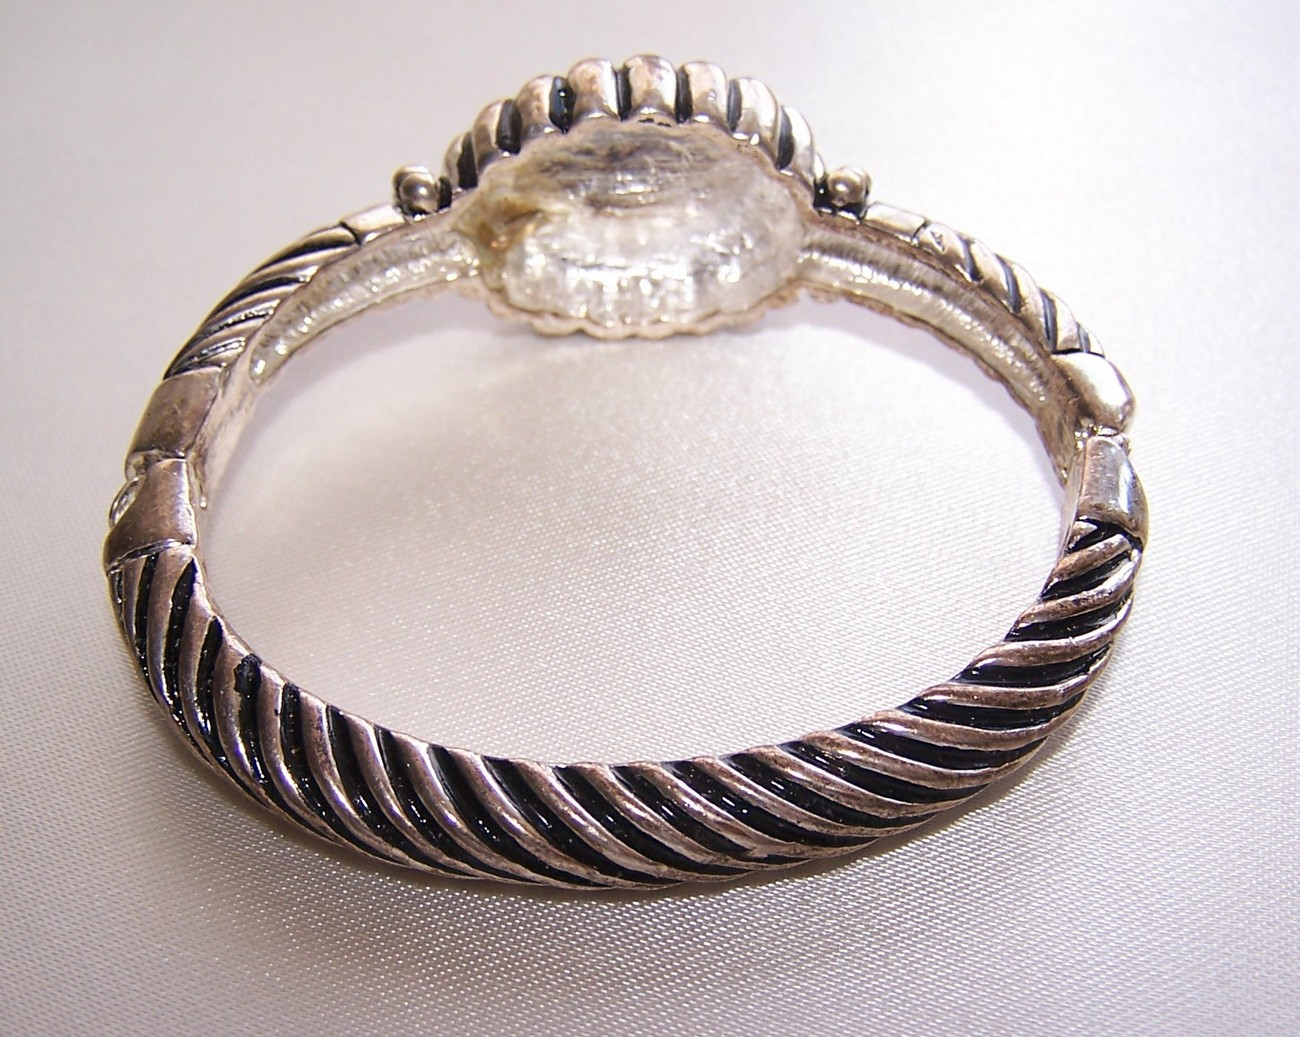 Vintage Faux Turquois, Enamel & Silver Metal Cuff Bracelet